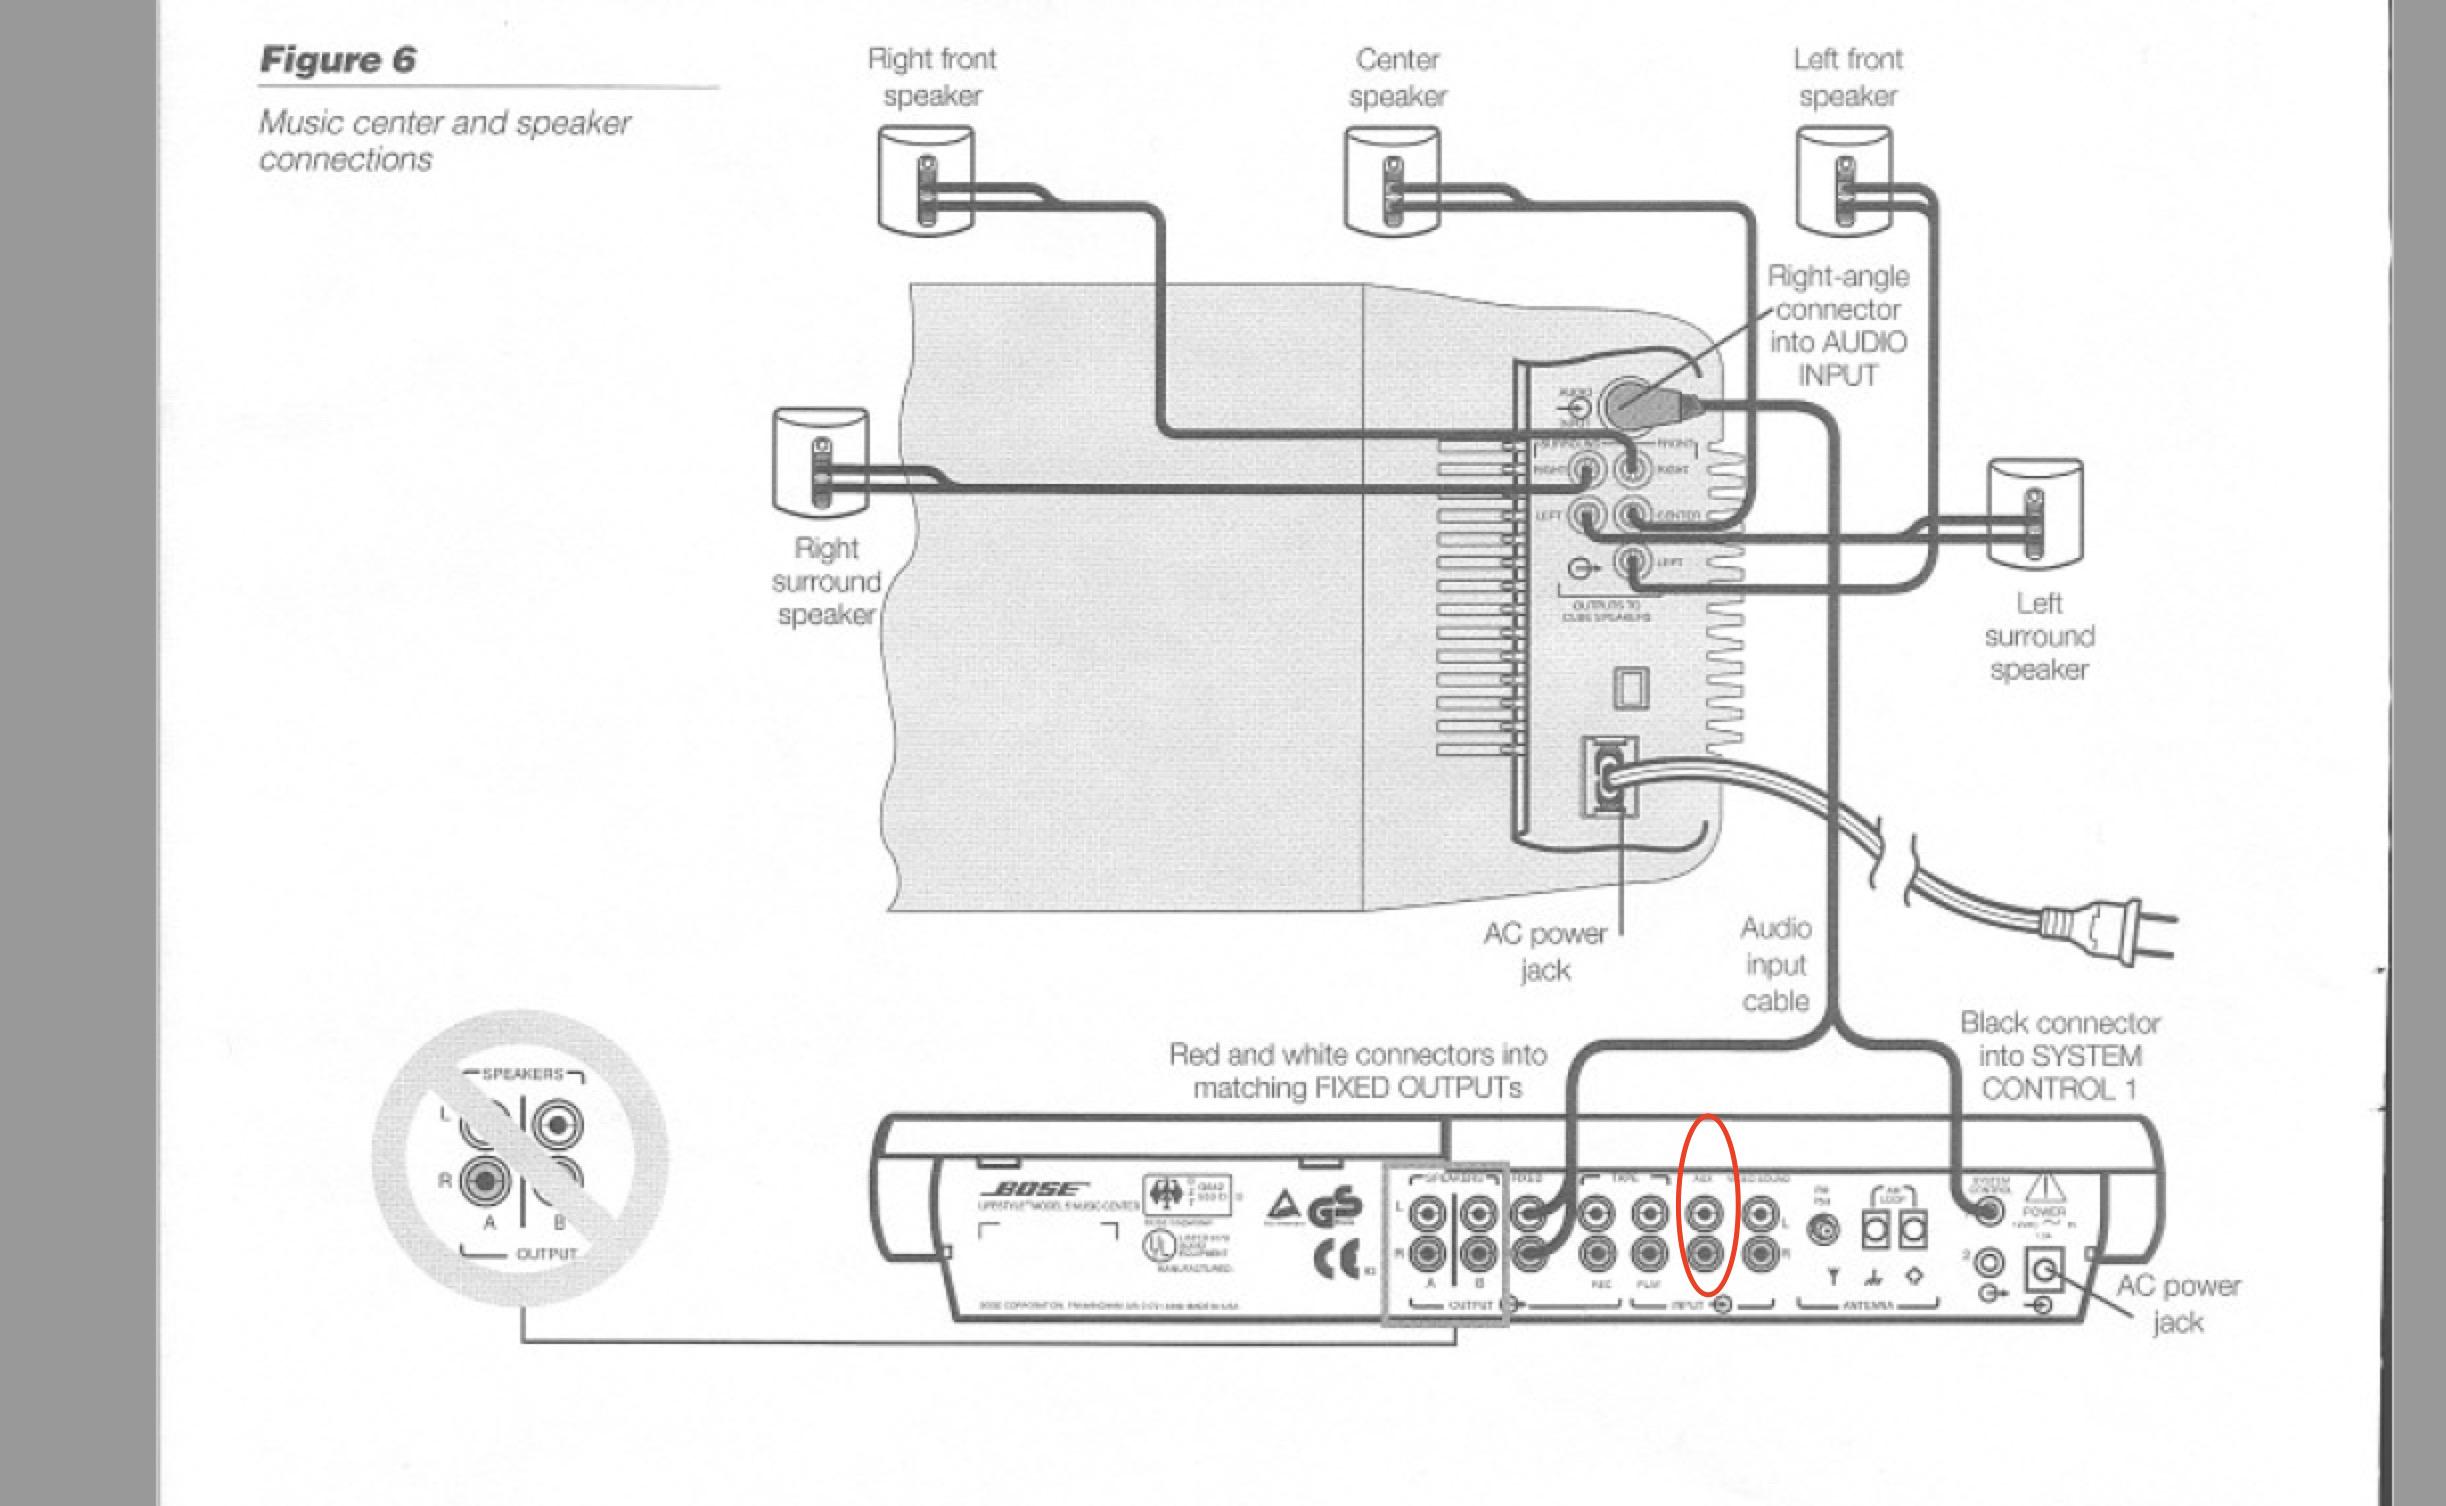 Bose Subwoofer Wiring Diagram Bose Subwoofer Cable Wiring Di.Mazda 6 ...